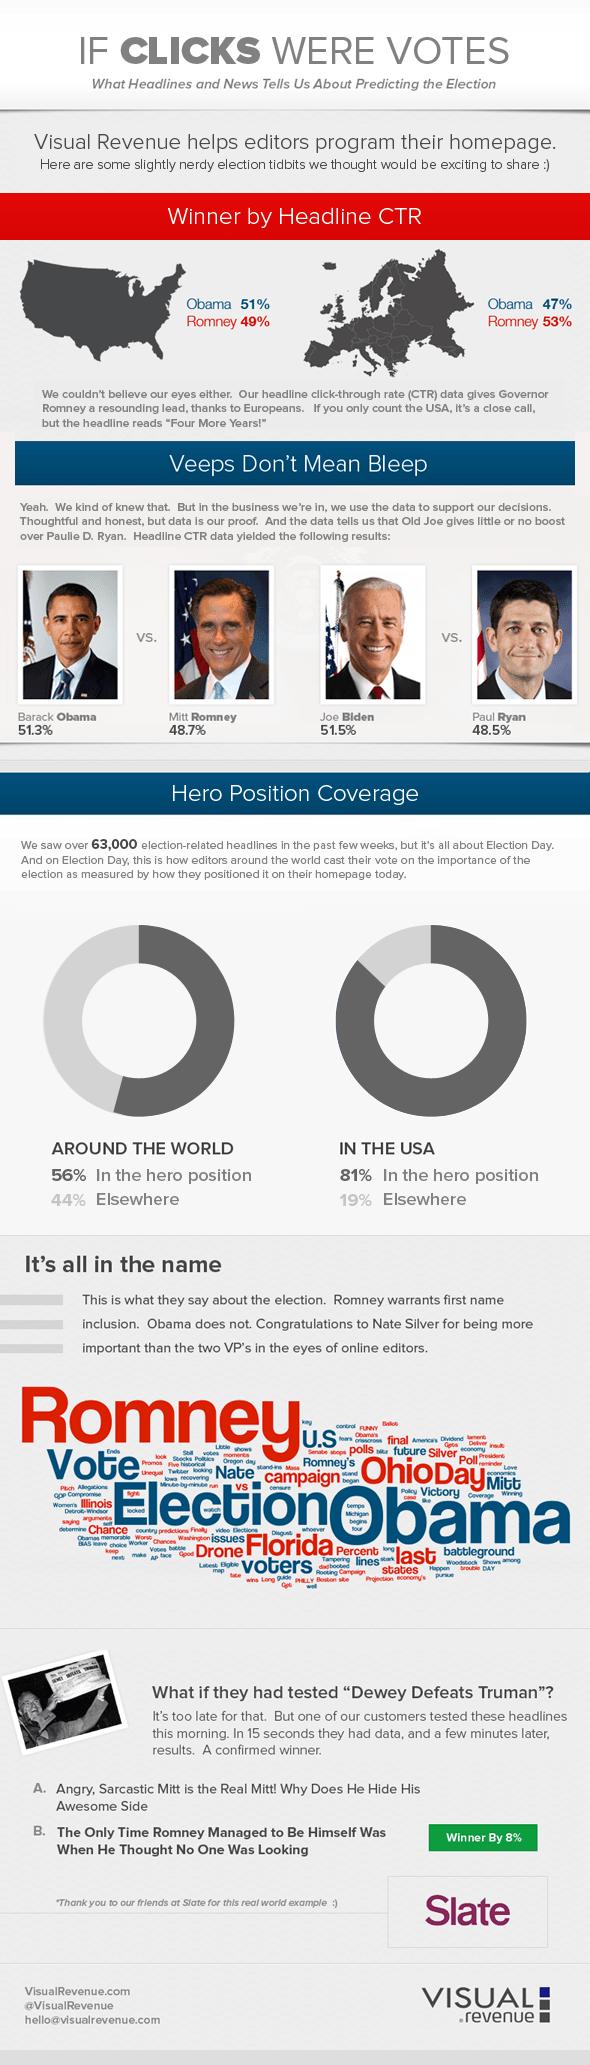 Visual revenue us election click data